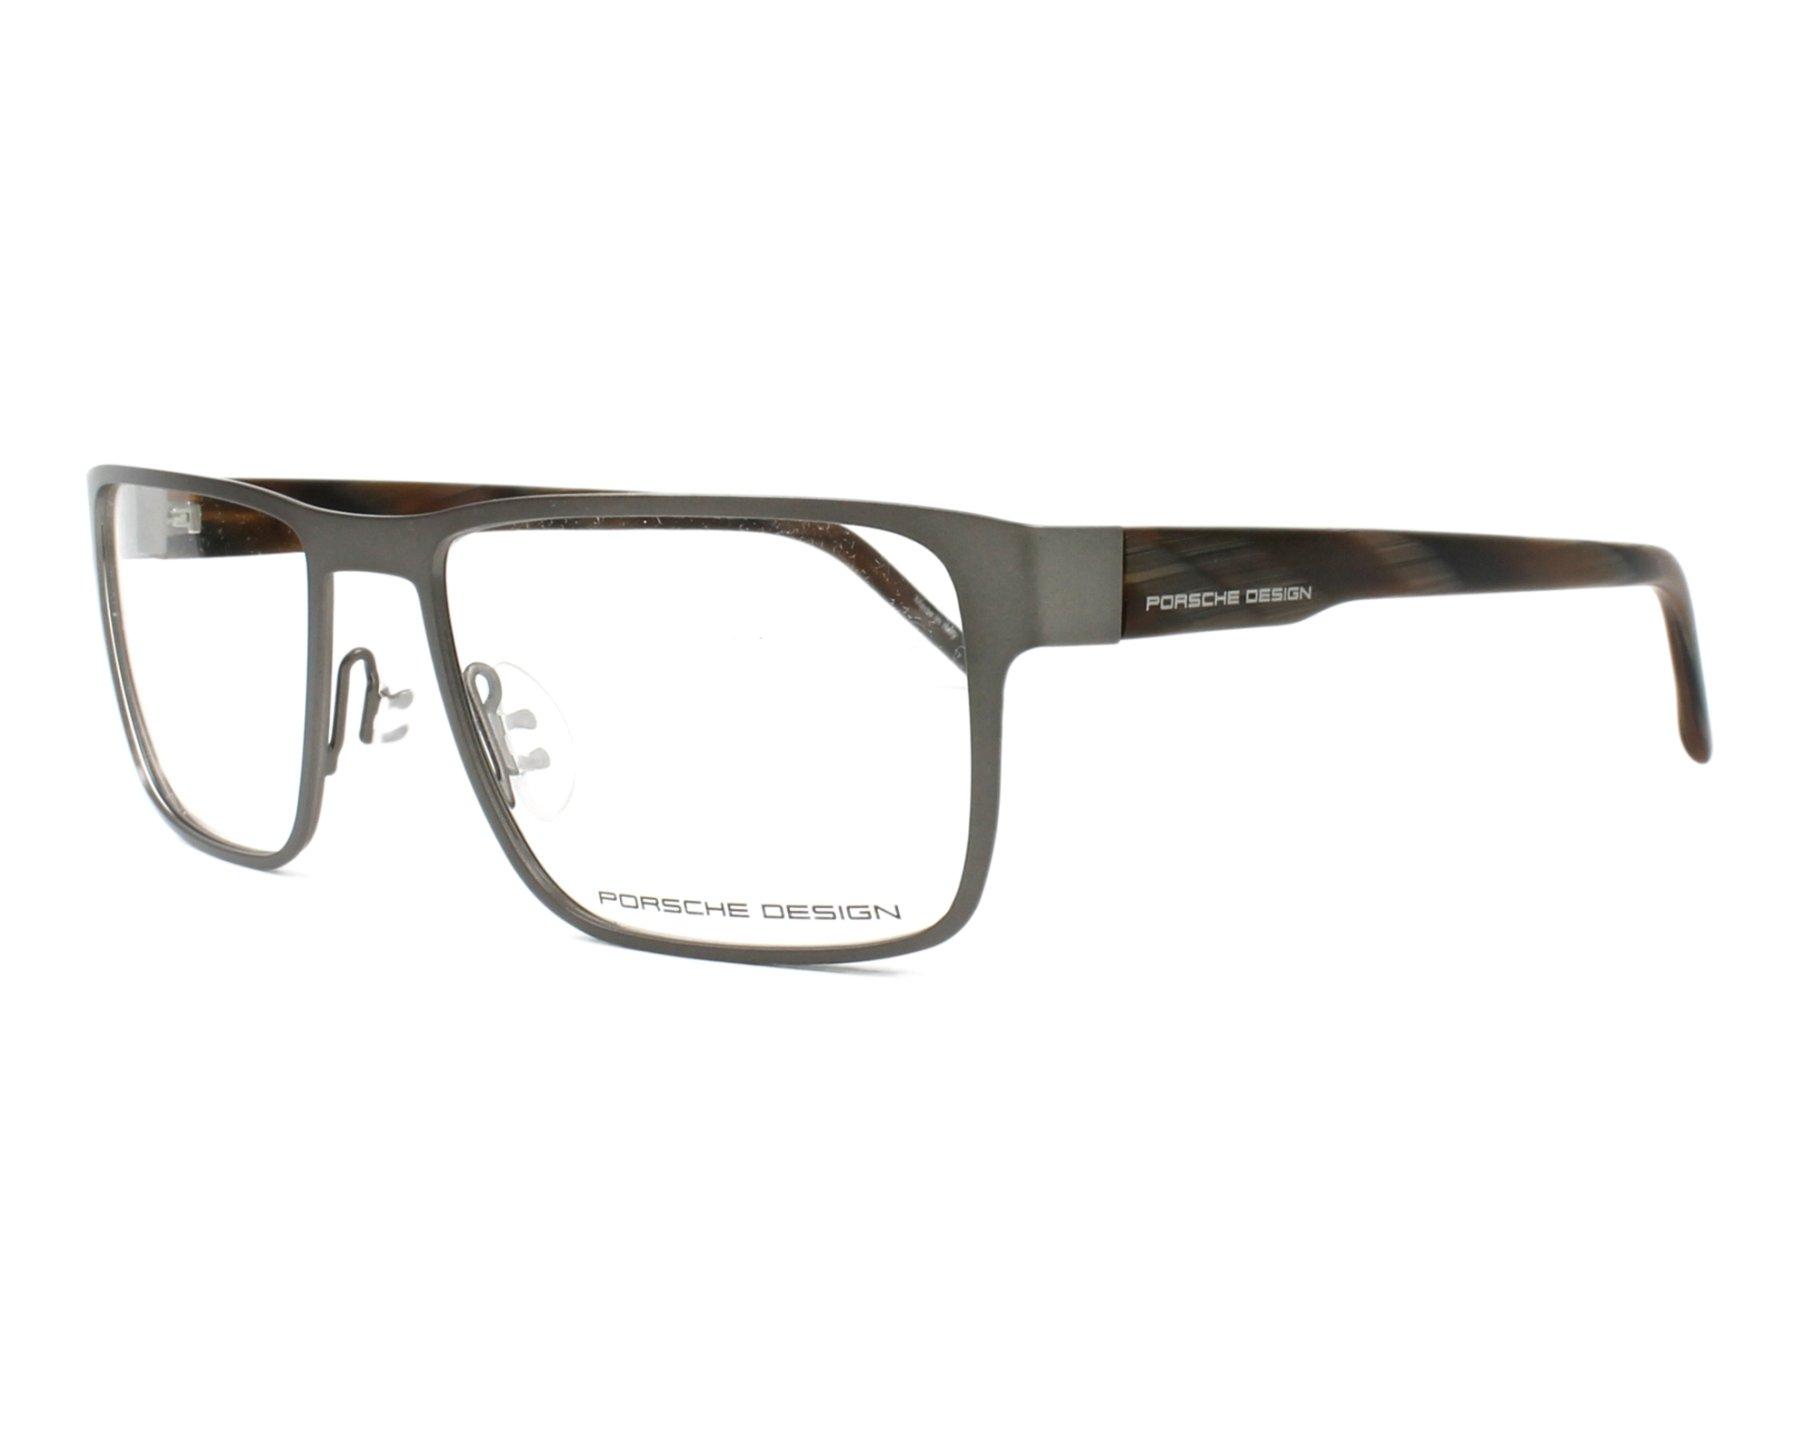 lunettes de vue porsche design p 8292 b gunmetal. Black Bedroom Furniture Sets. Home Design Ideas